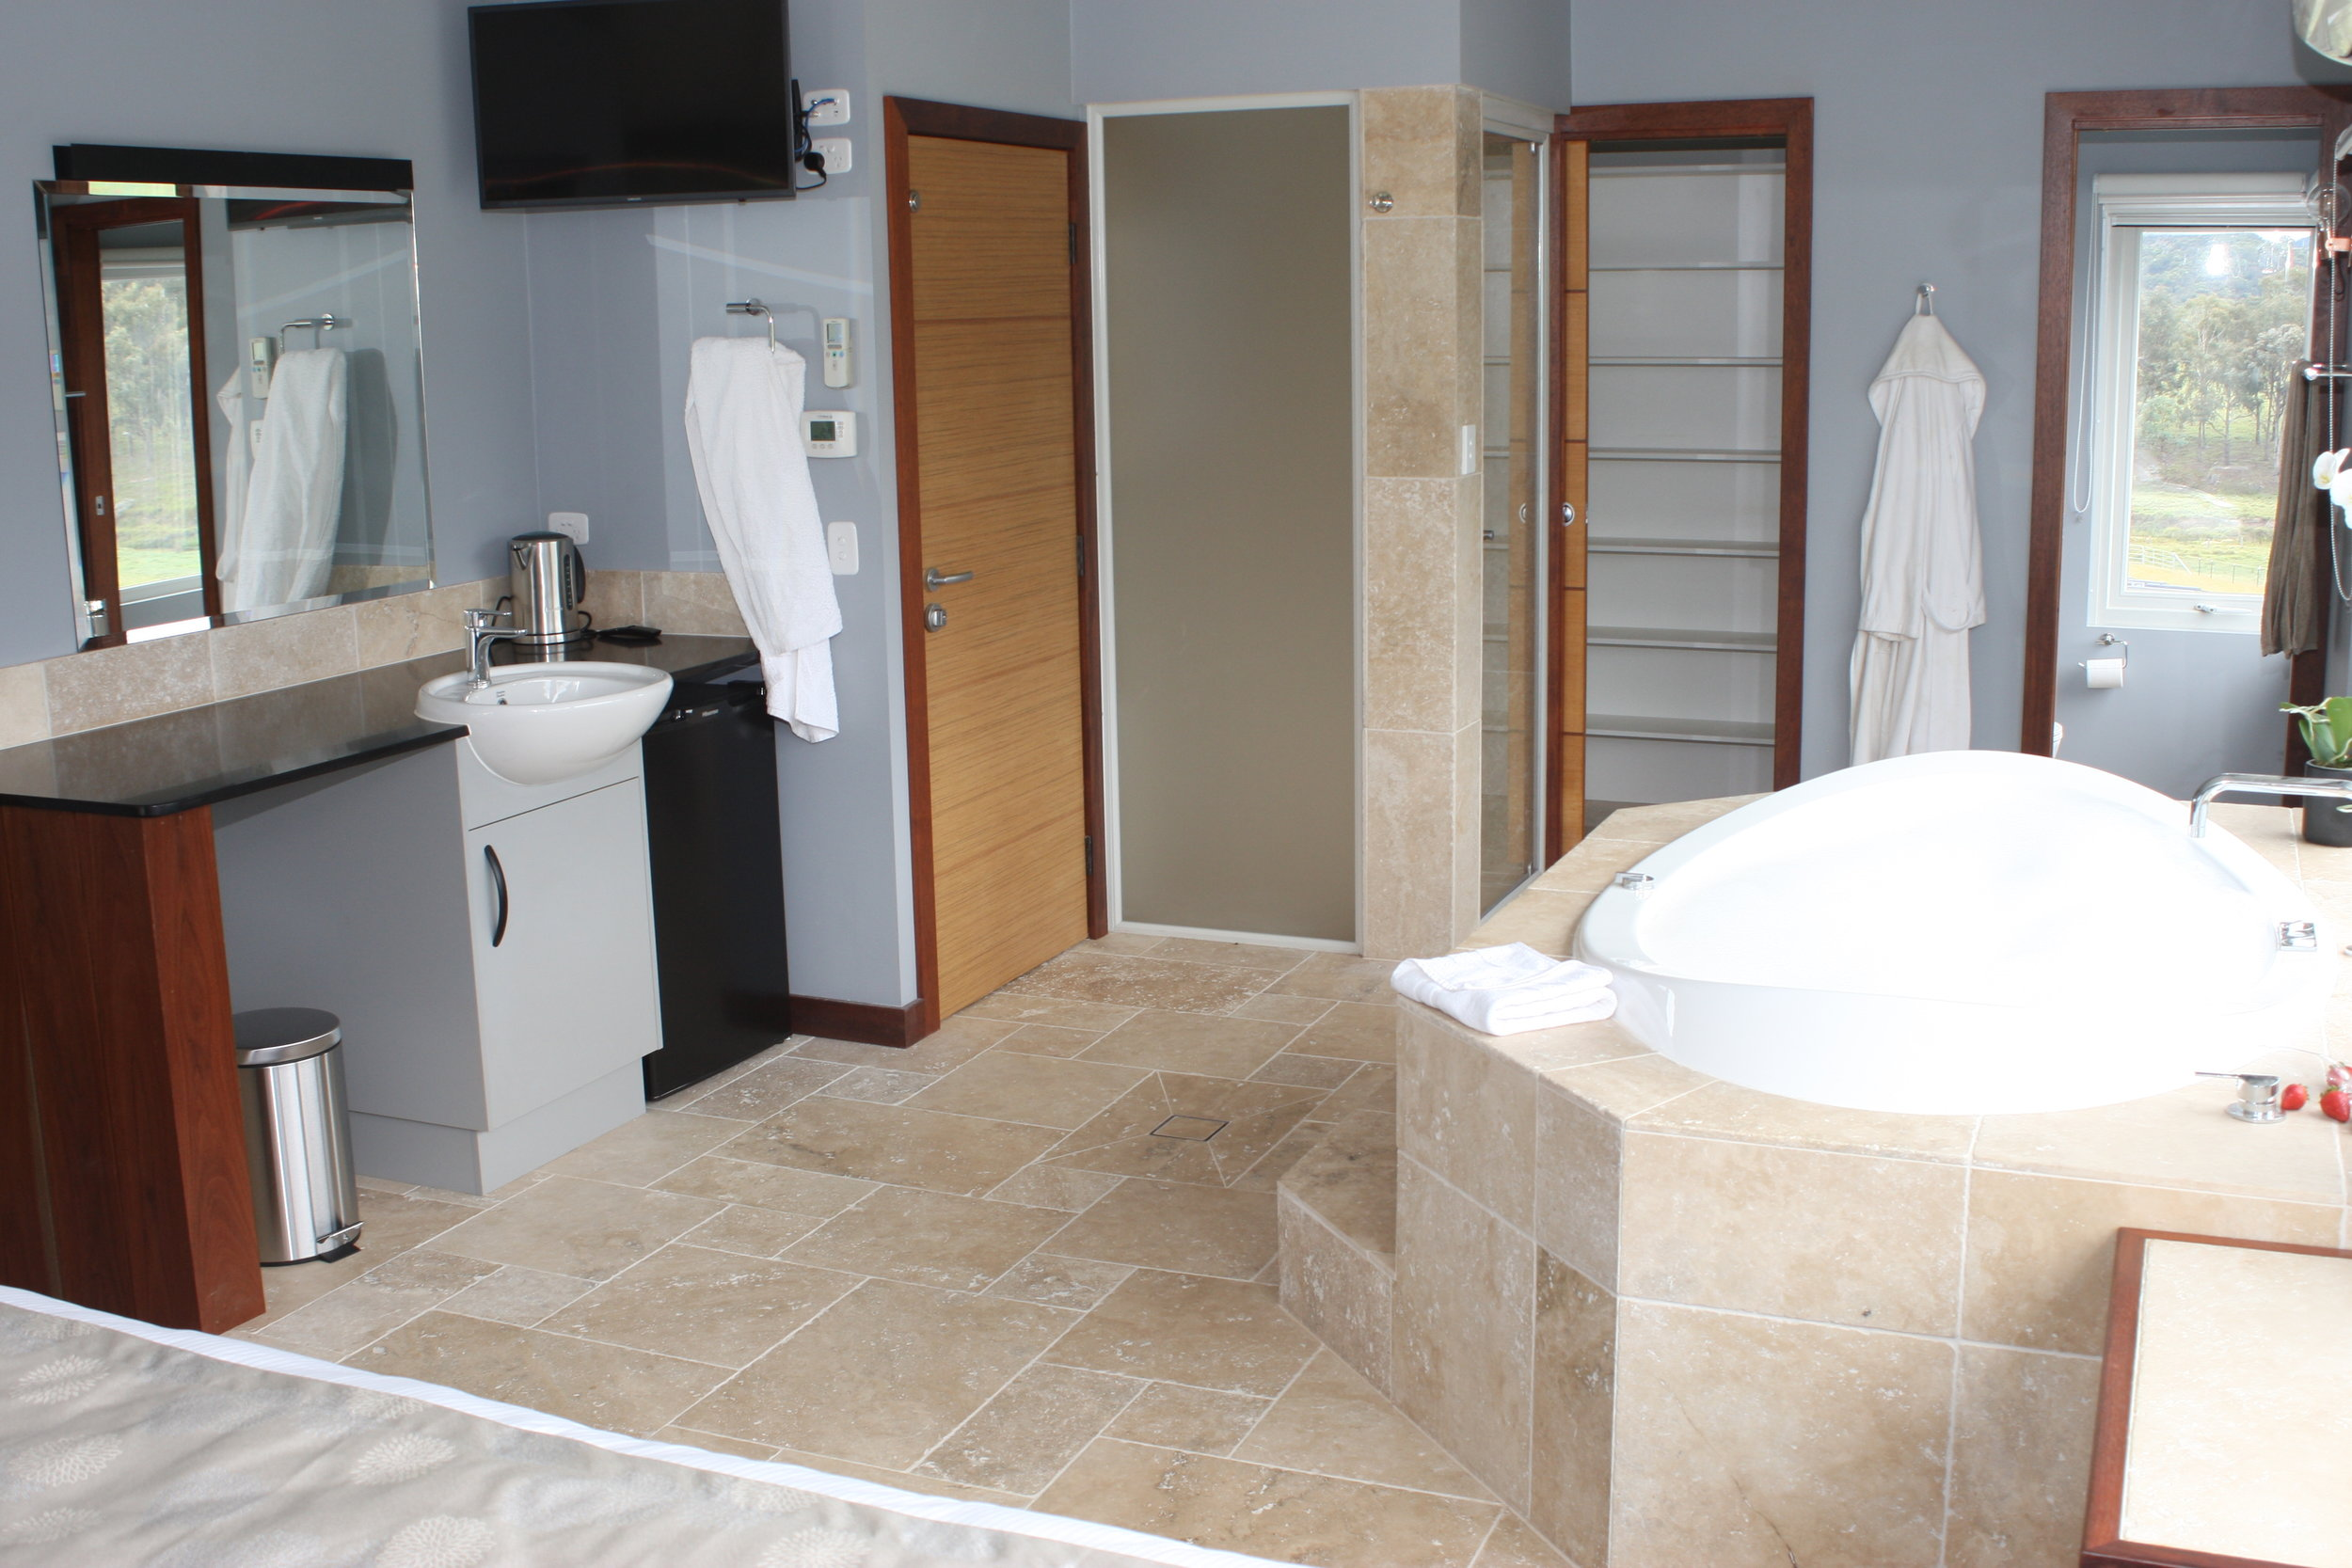 Ensuite Shower Wardrobe and Toilet